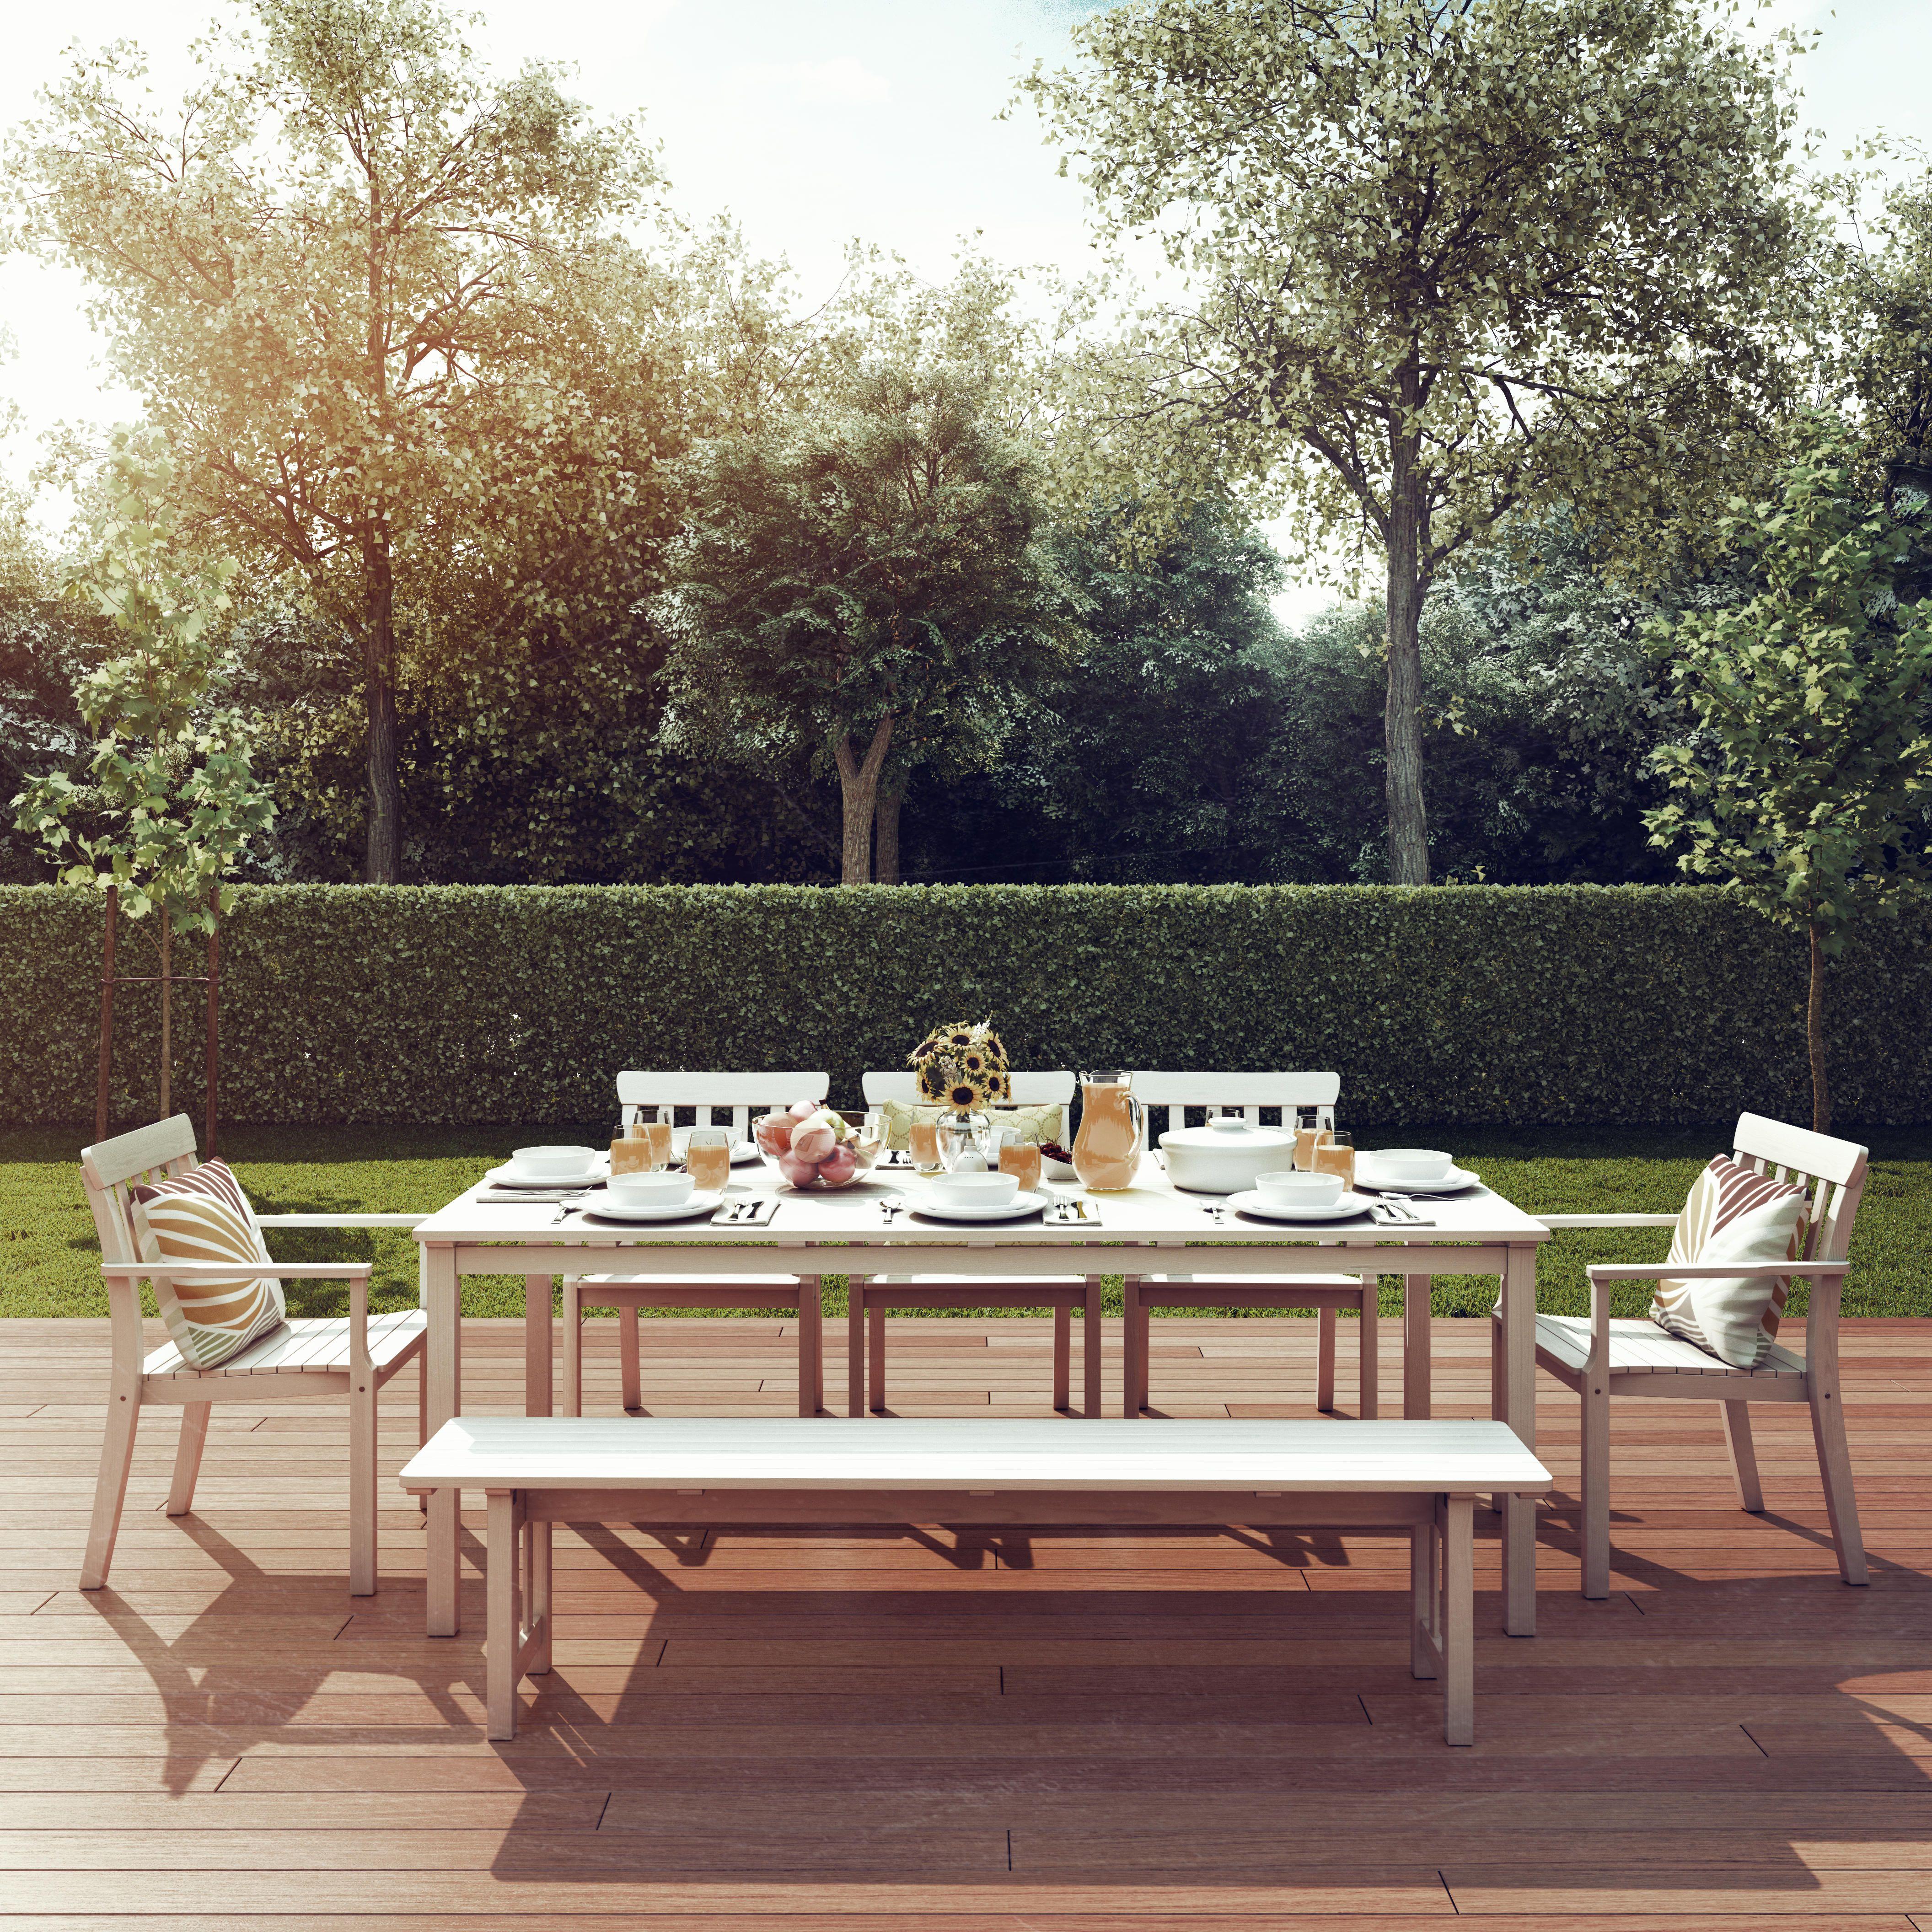 Ikea falster garden furniture design youtube - Free 3d Models Ikea Angso Outdoor Furniture Series